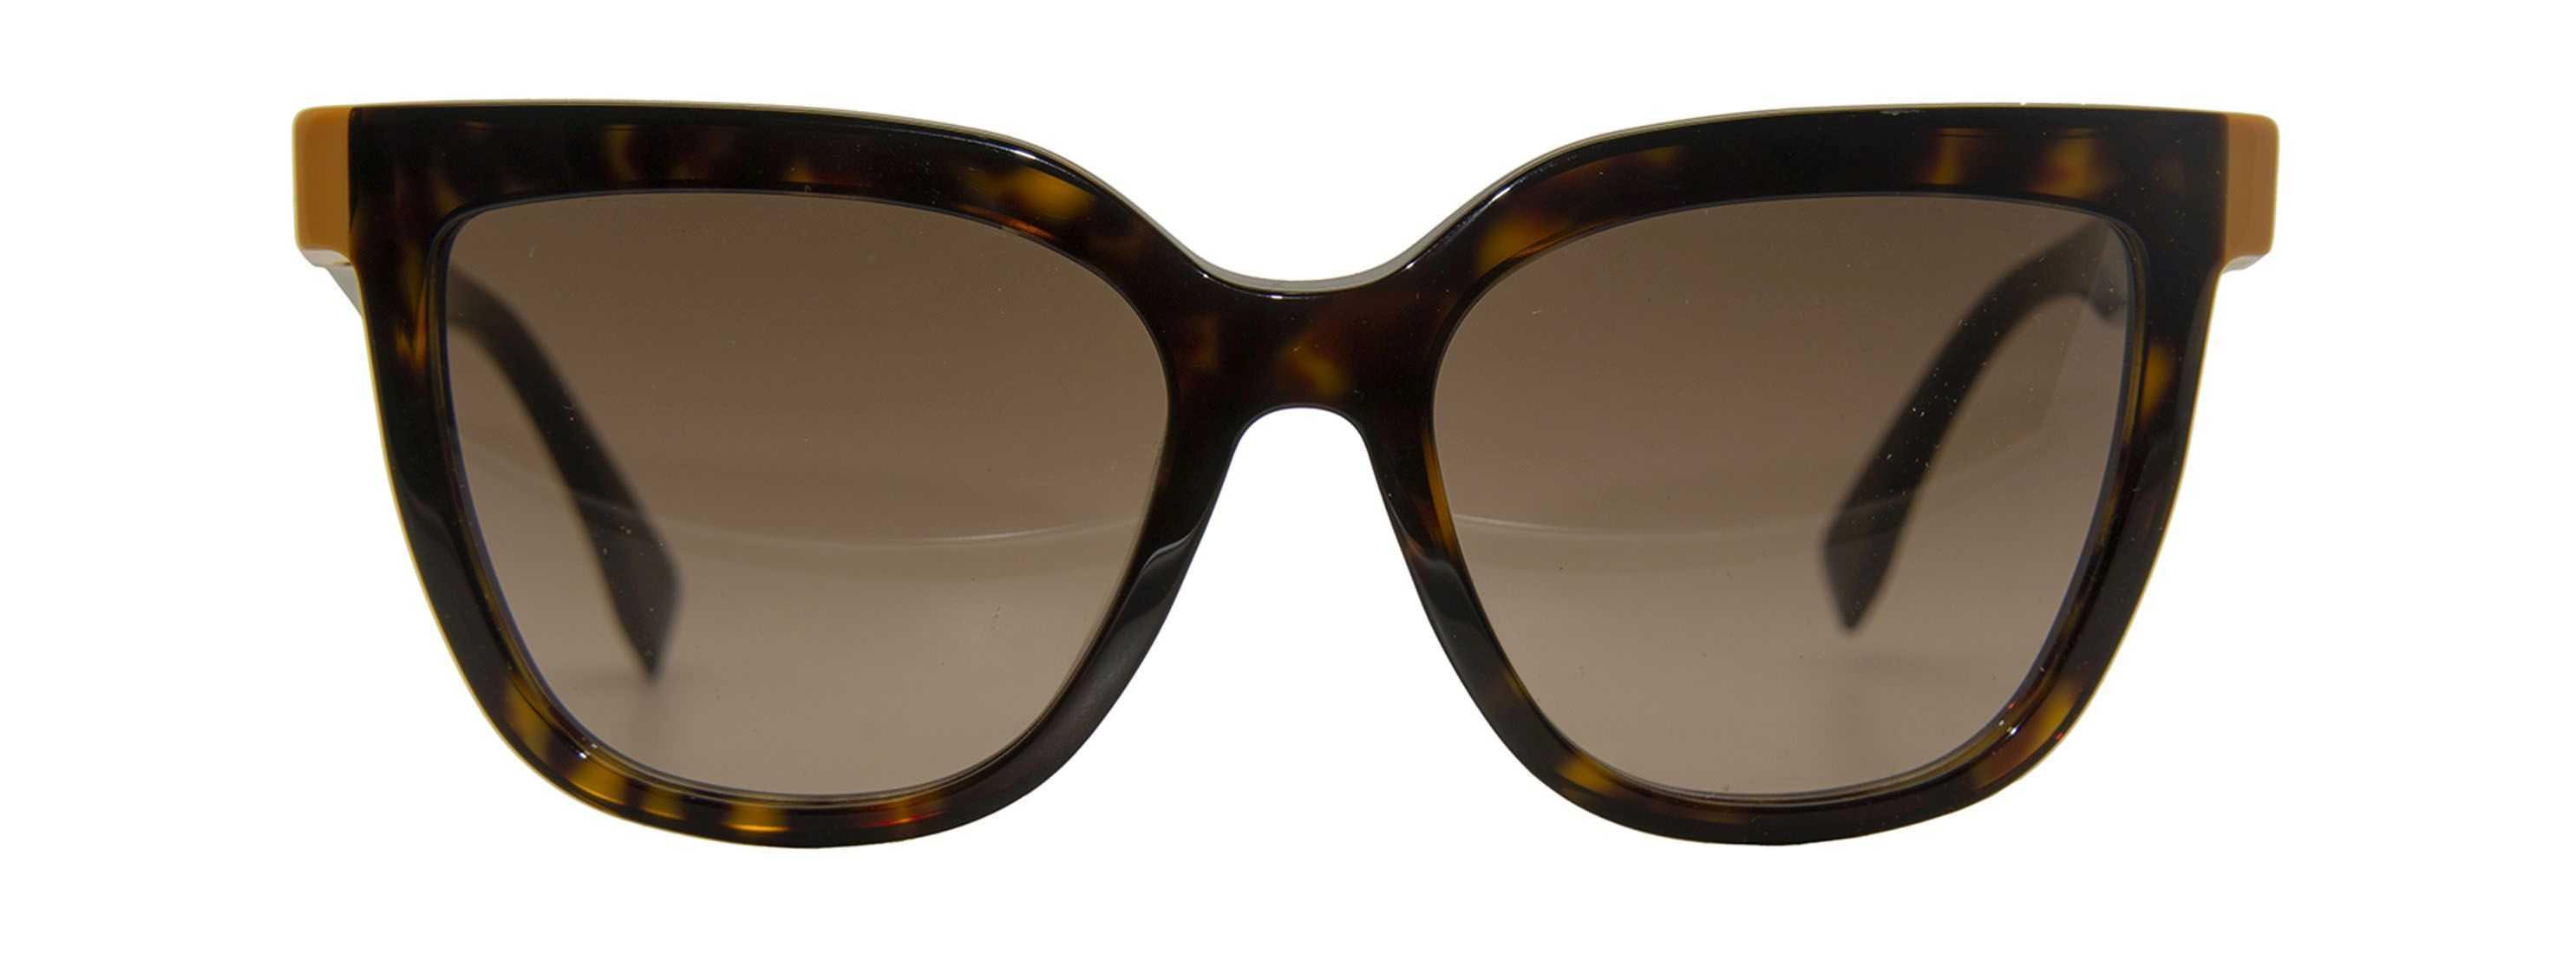 Fendi sunglasses 0128 Trdj6 01 2970x1100